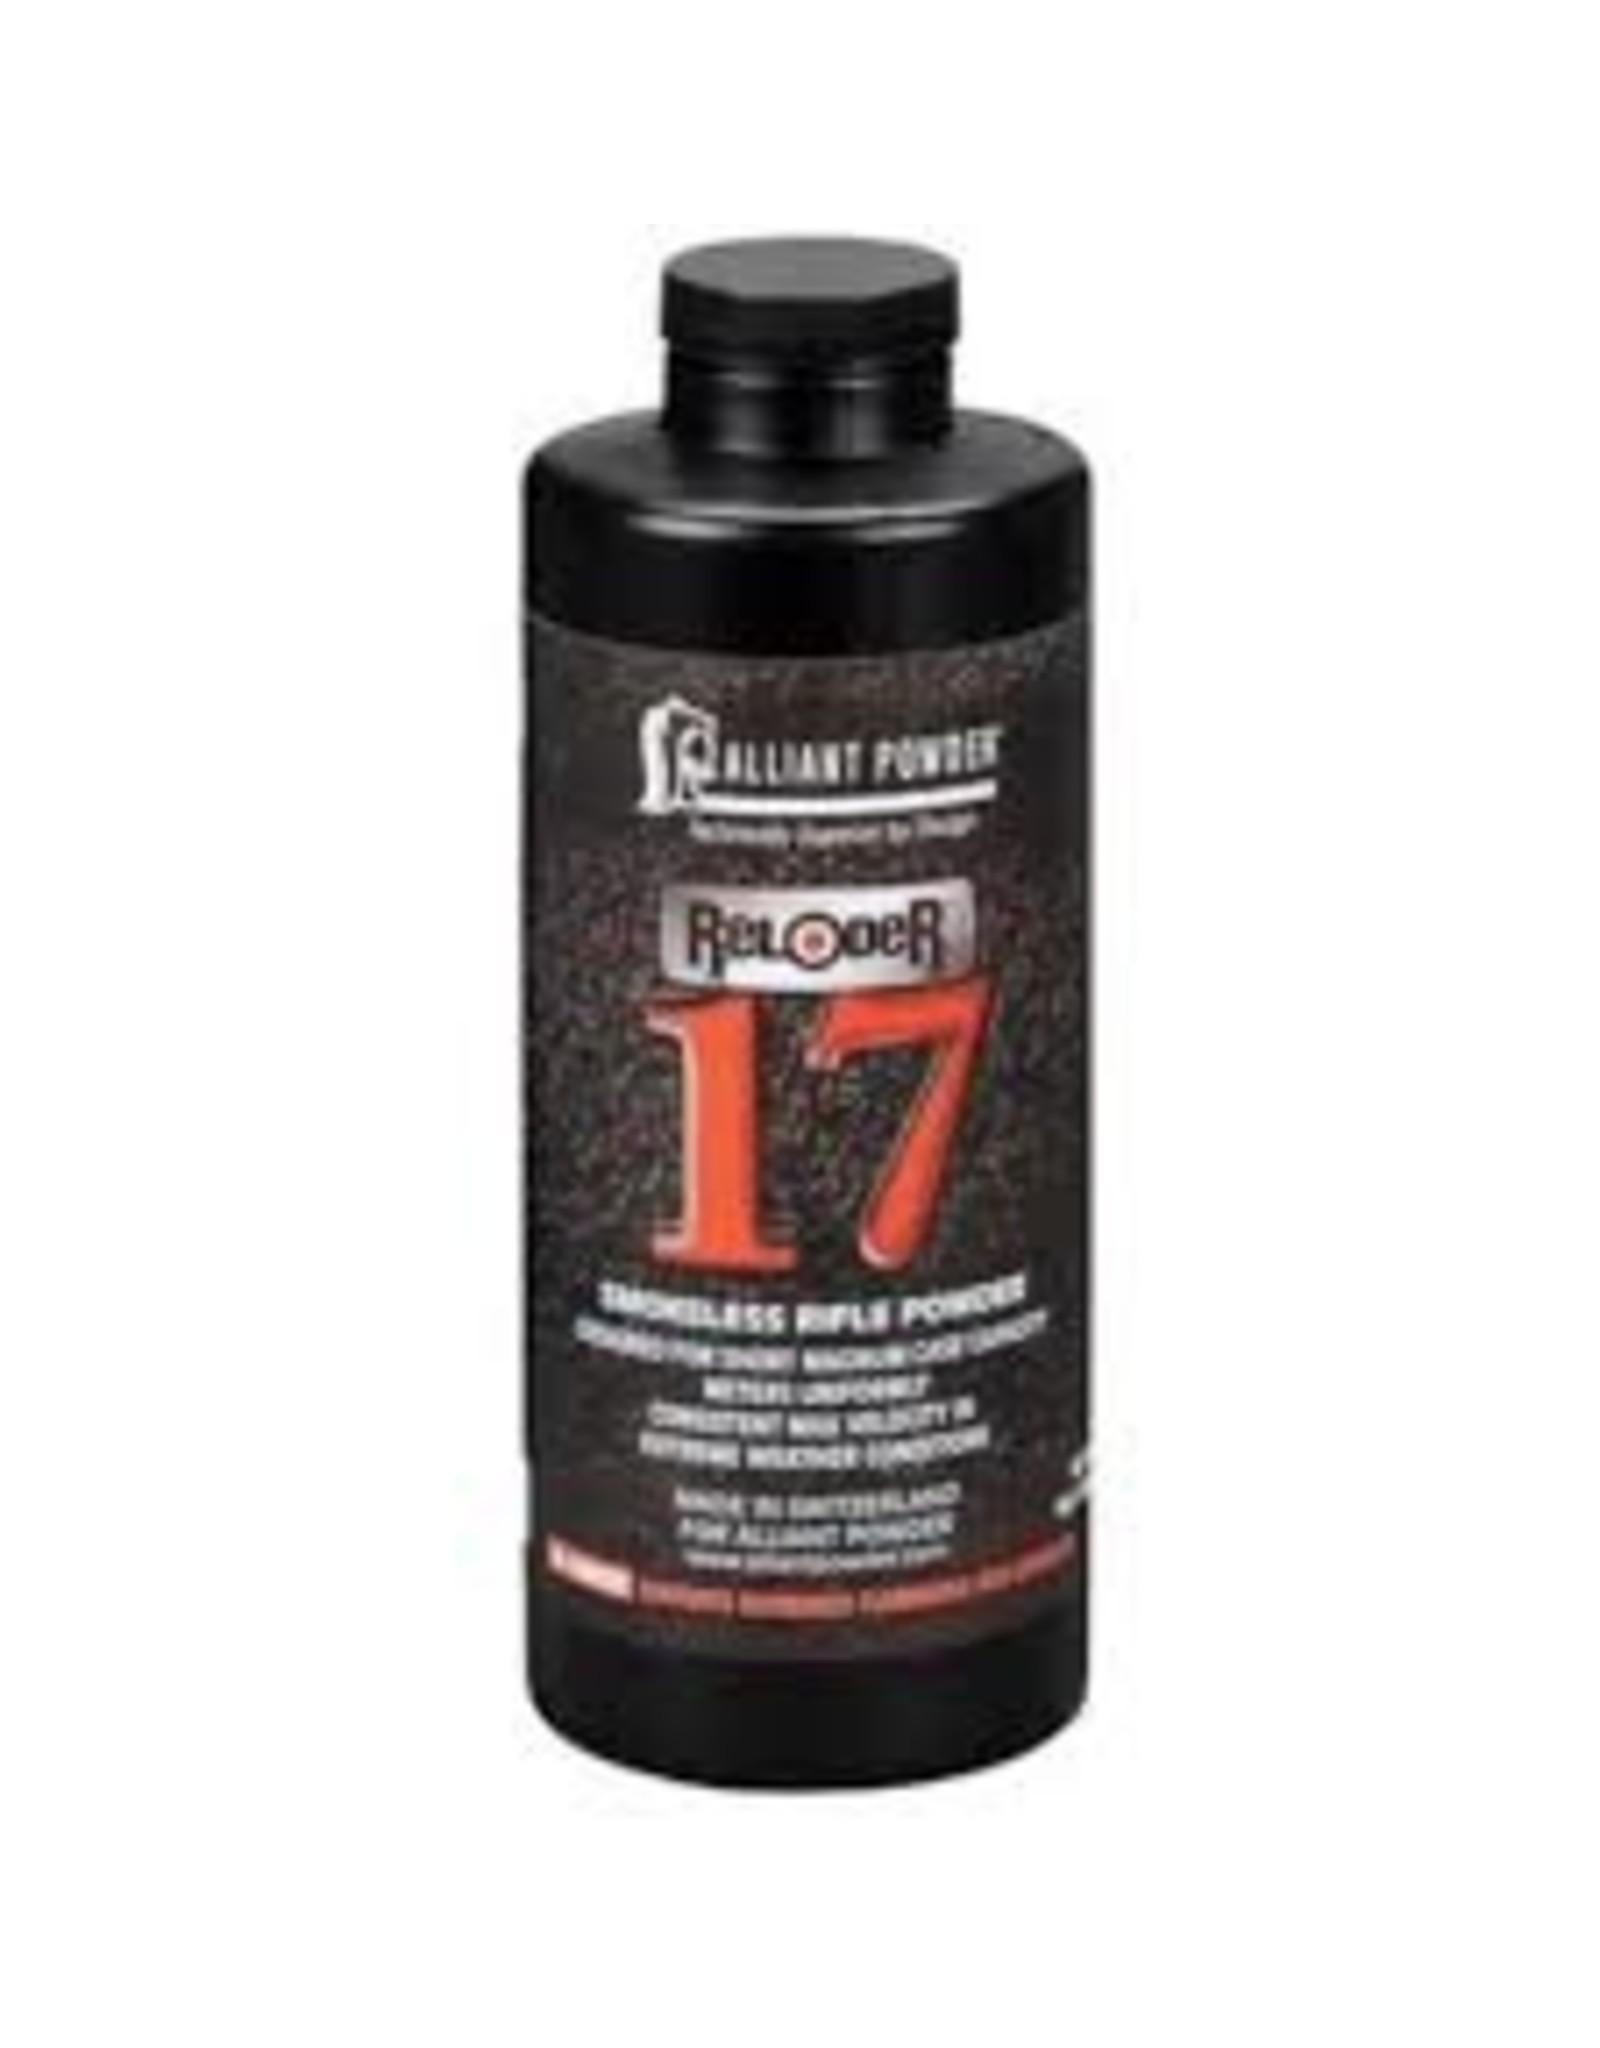 Alliant Powder Alliant Powder  Reloder 17 Smokeless Rifle Powder 1LB